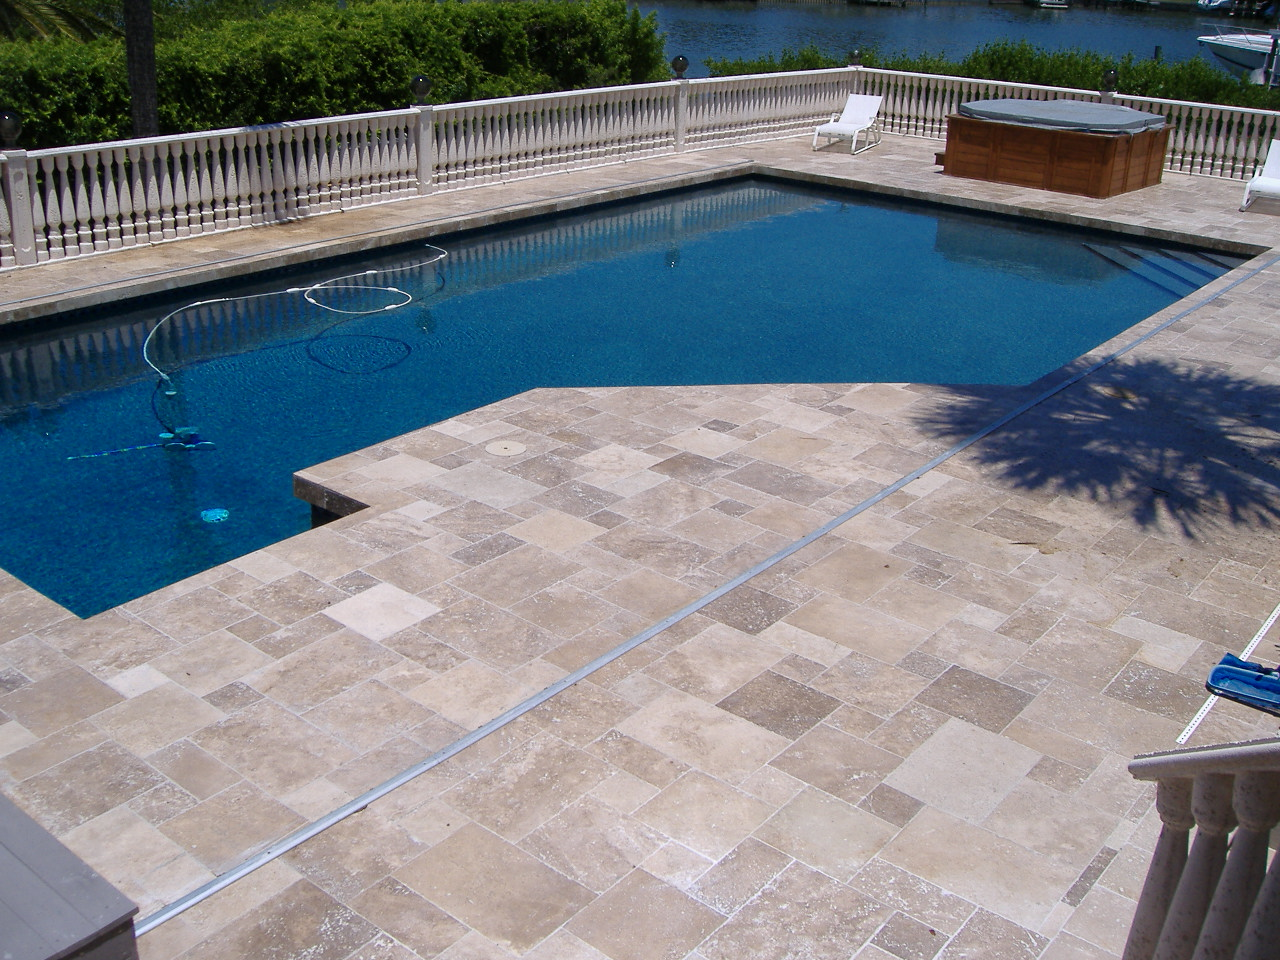 Classic Pool Tile Atlanta Georgia Travertine Coping And Decking